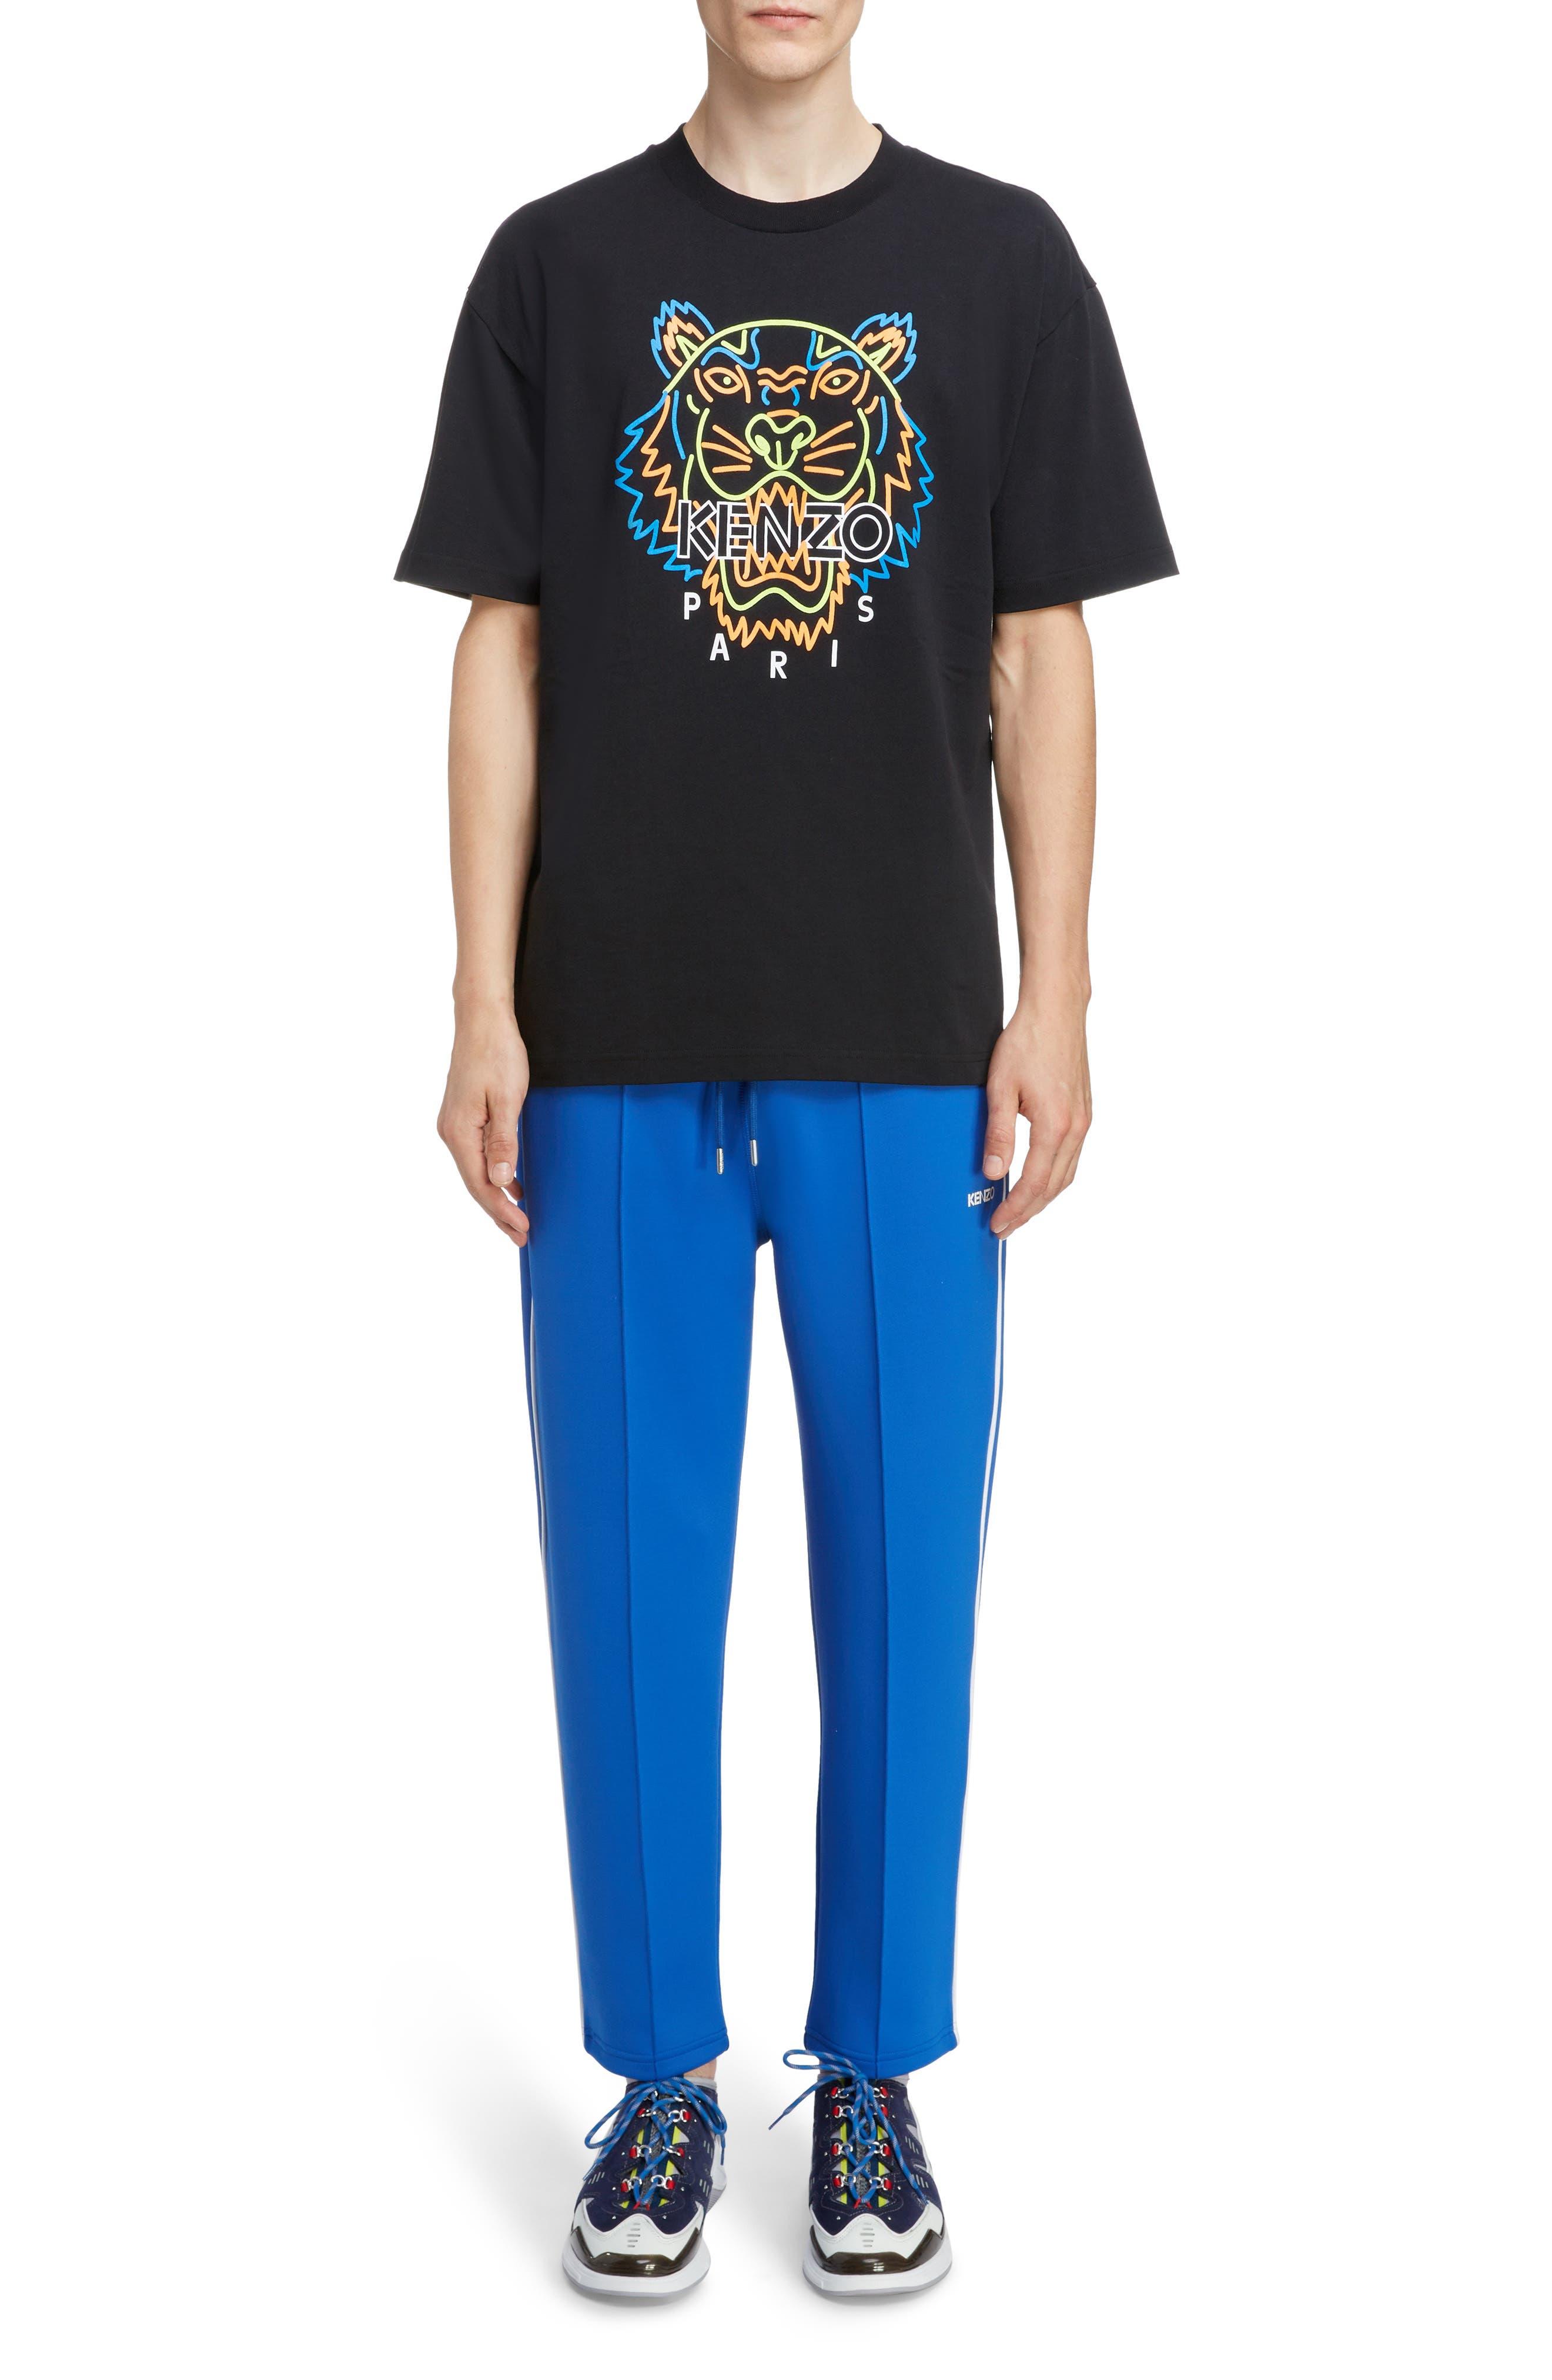 Kenzo T-shirts Neon Tiger Graphic T-Shirt